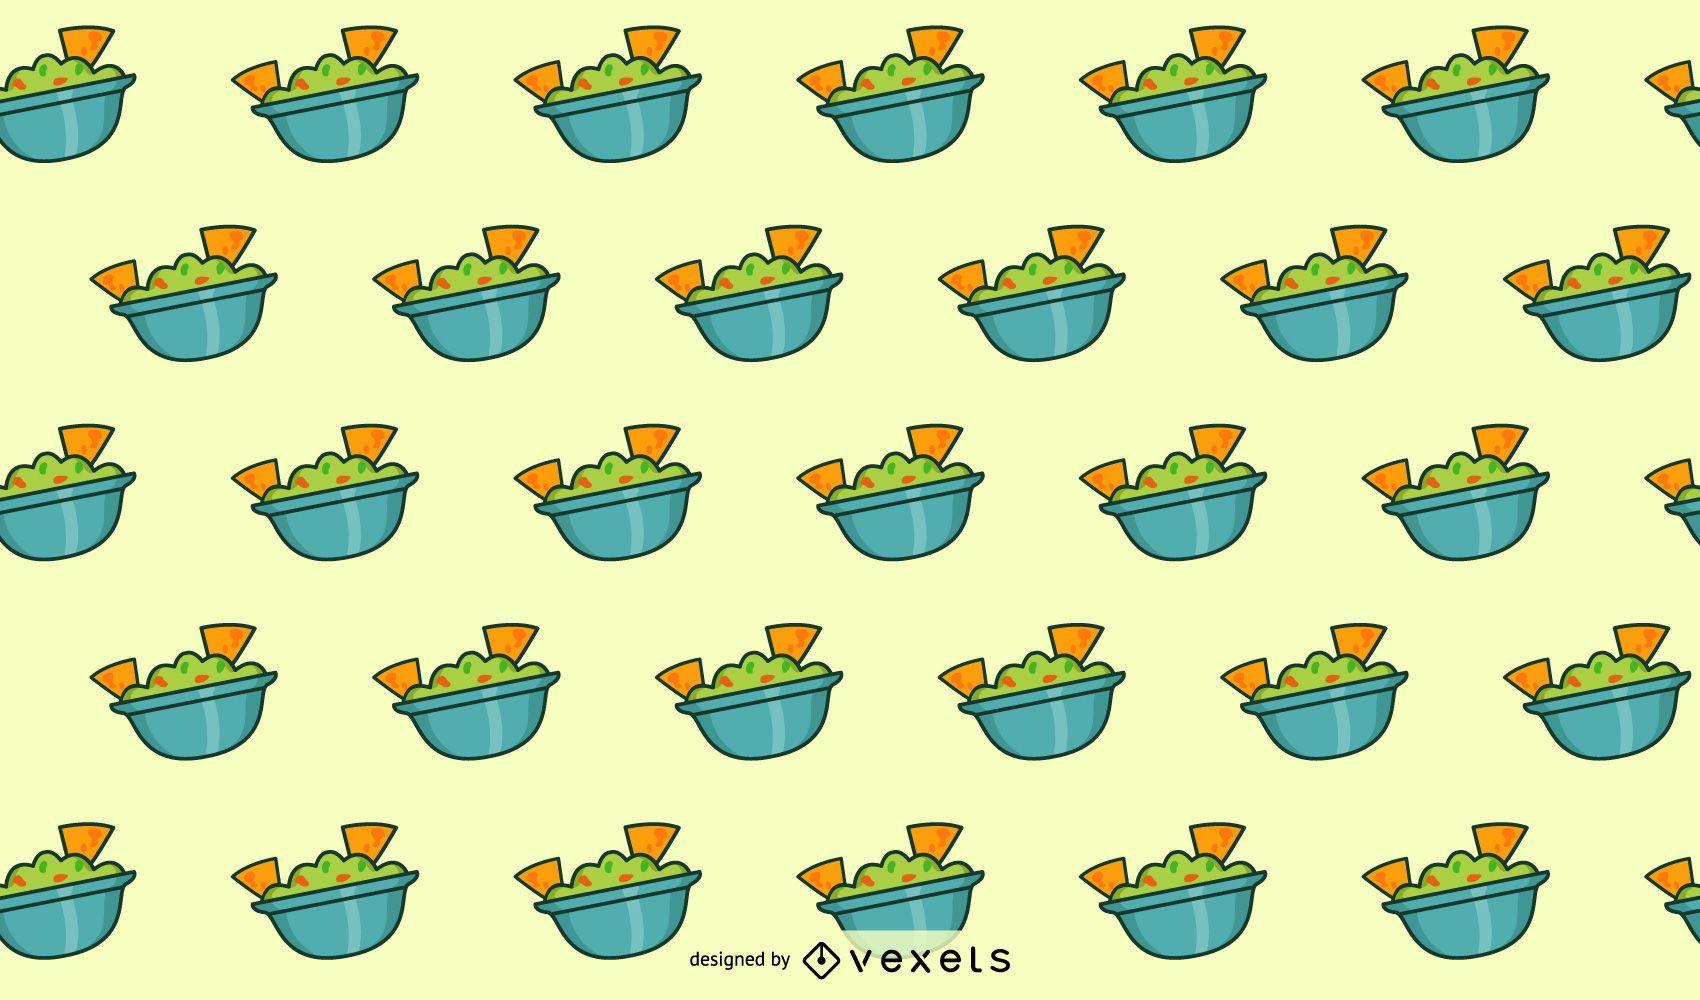 Guacamole pattern design